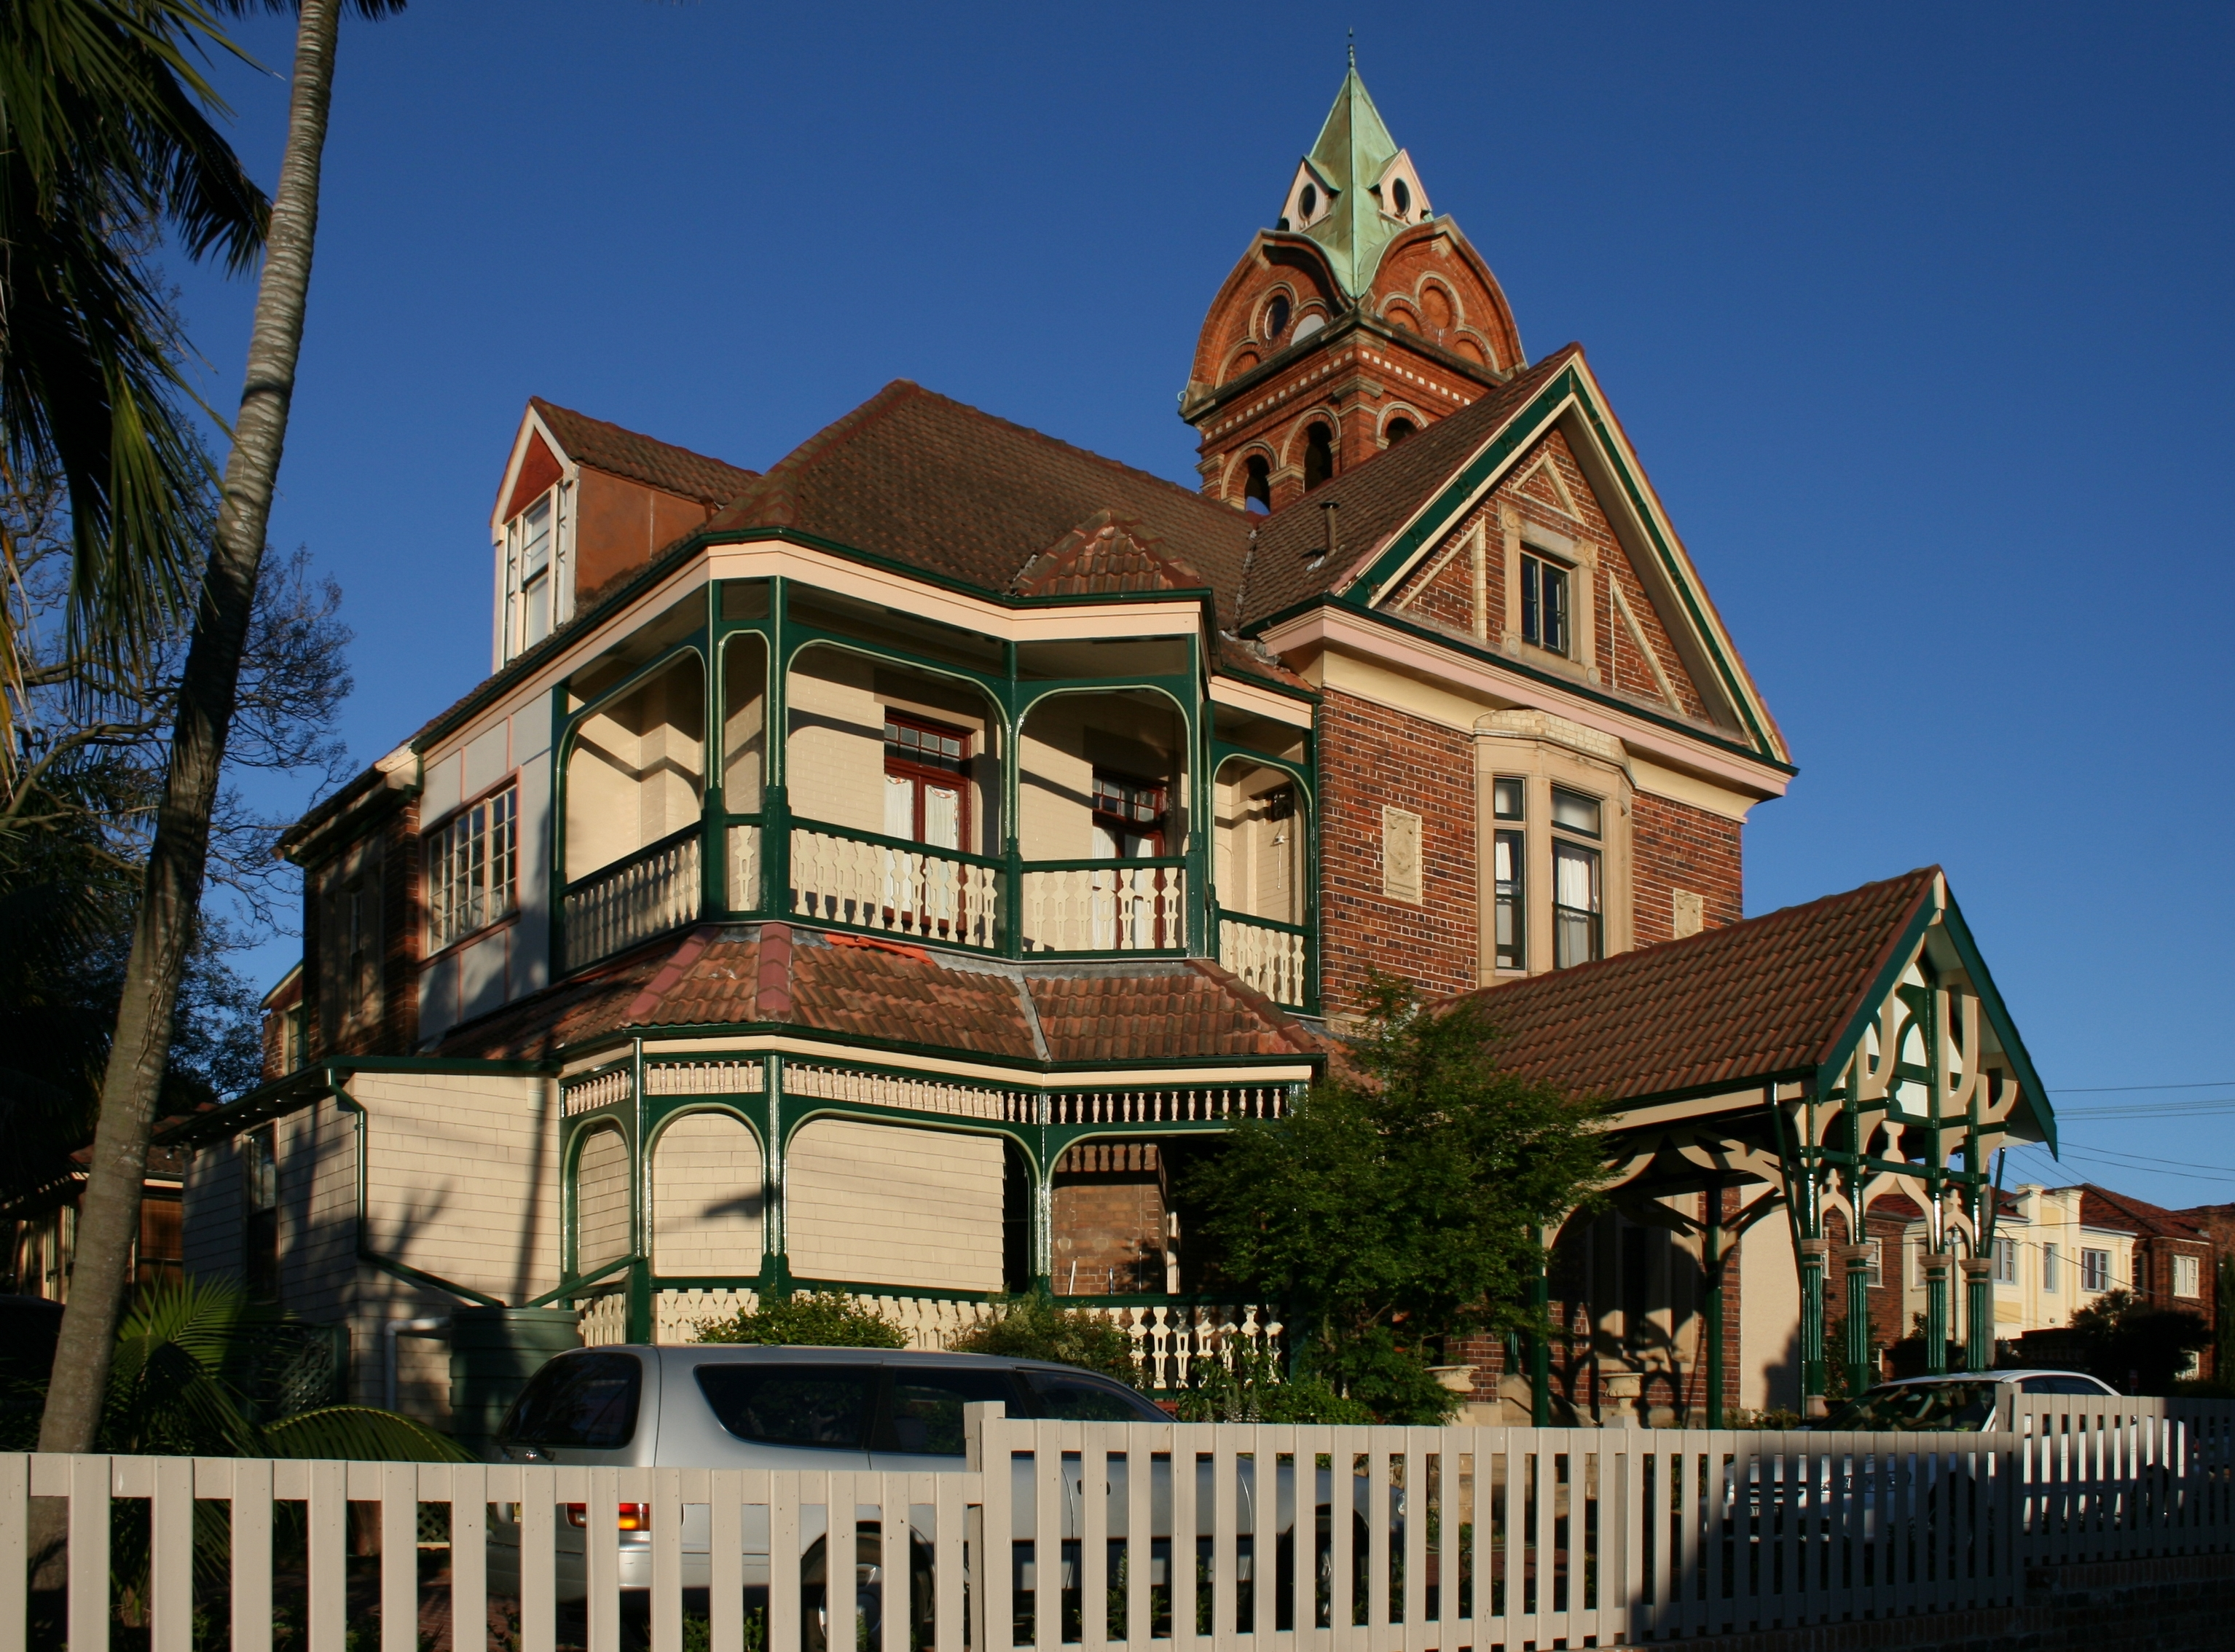 Berry Homes Park Staten Island